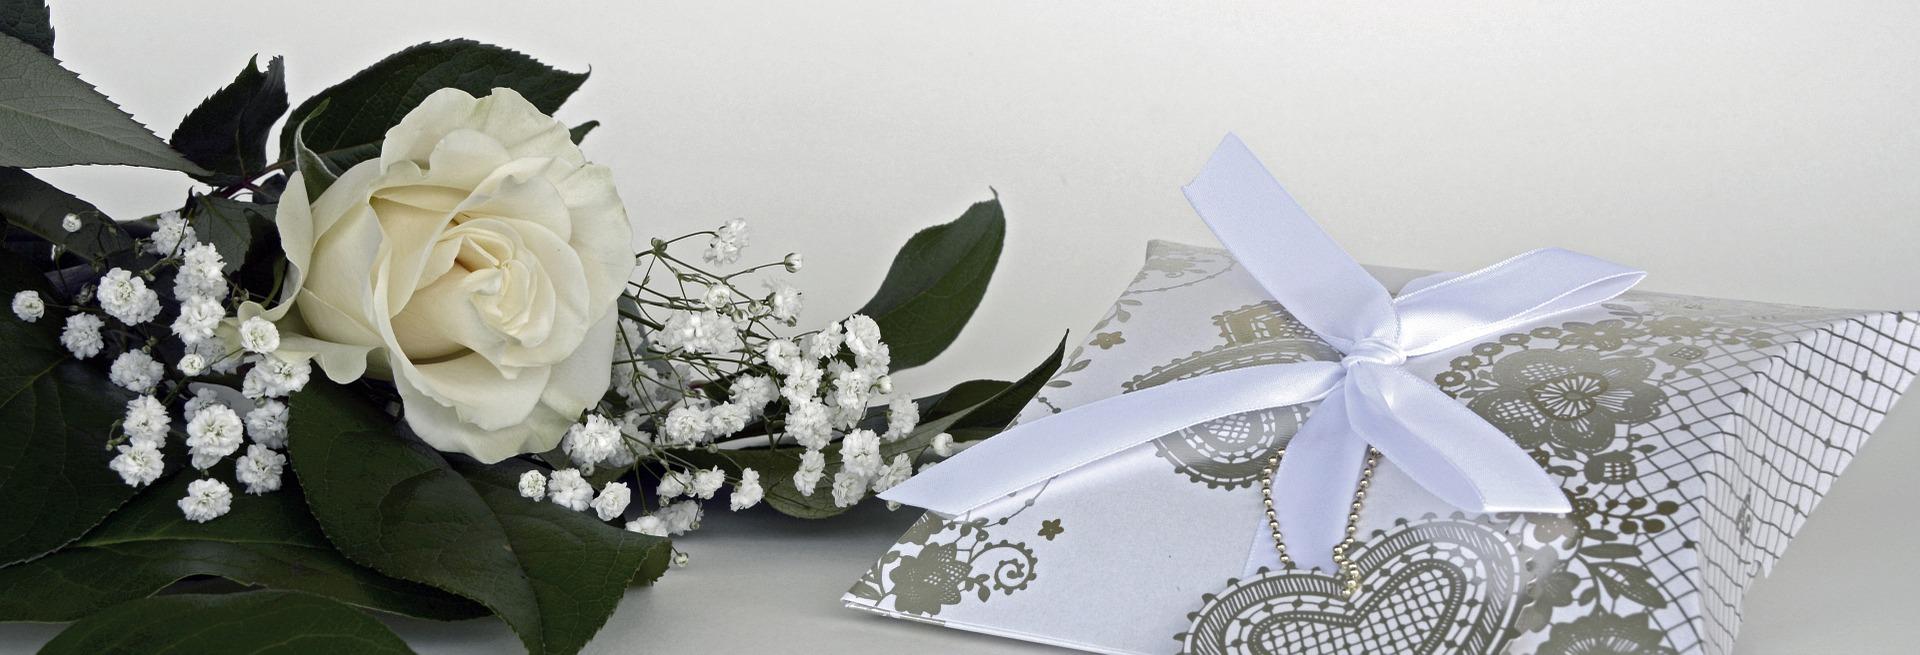 Online marriage in pakistan image